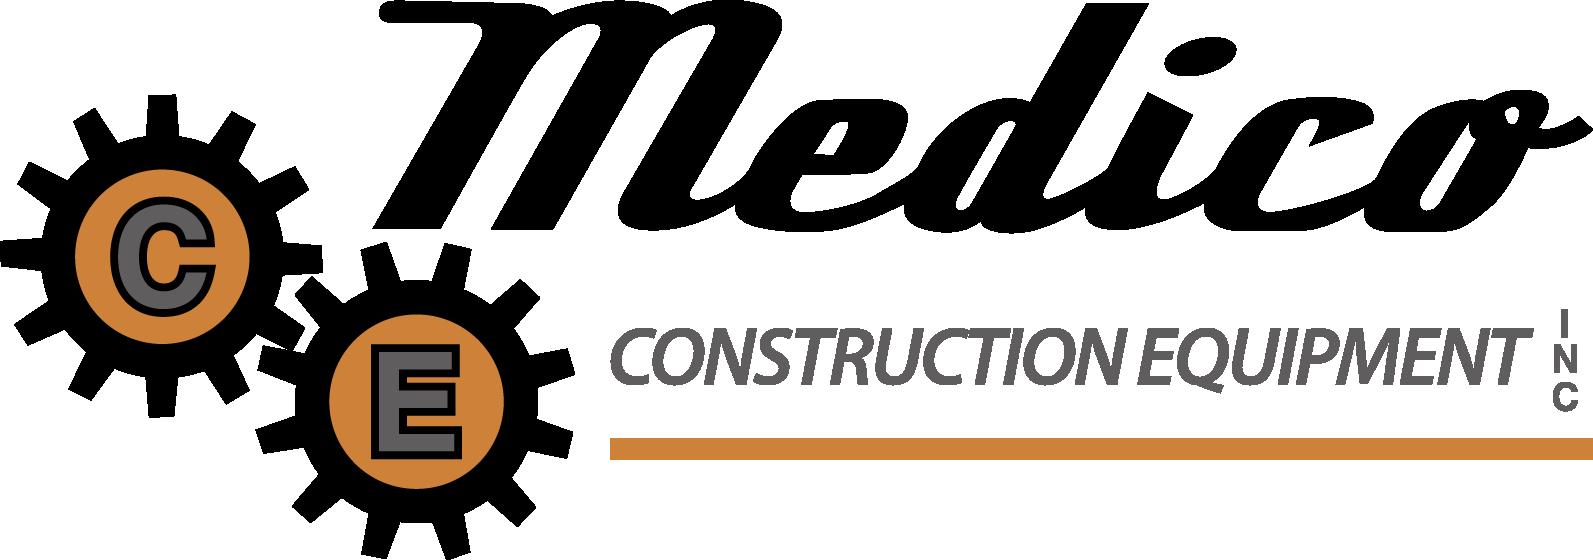 Medico Construction Equipment Inc. company logo